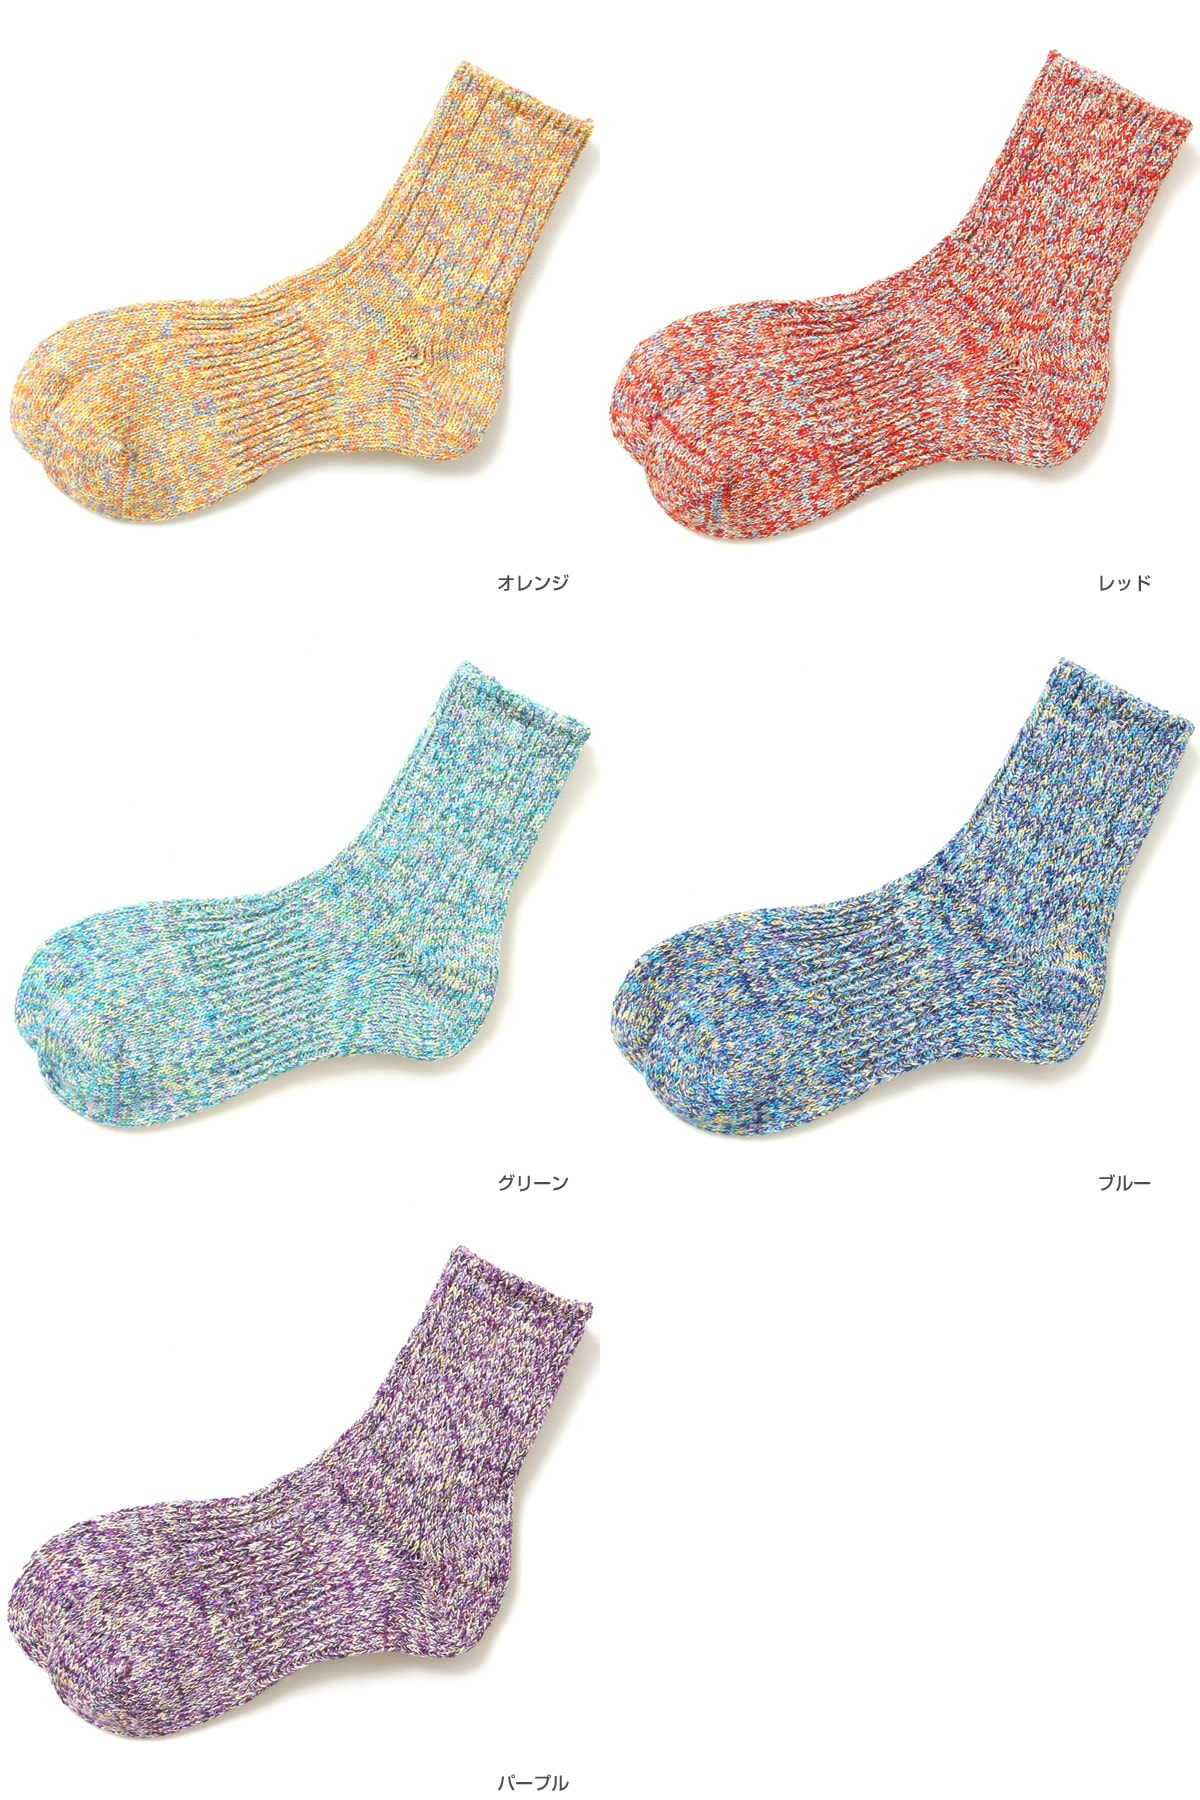 LE MONDE ル・モンド ルモンド 6色ツイスター杢ソックス 靴下 116607